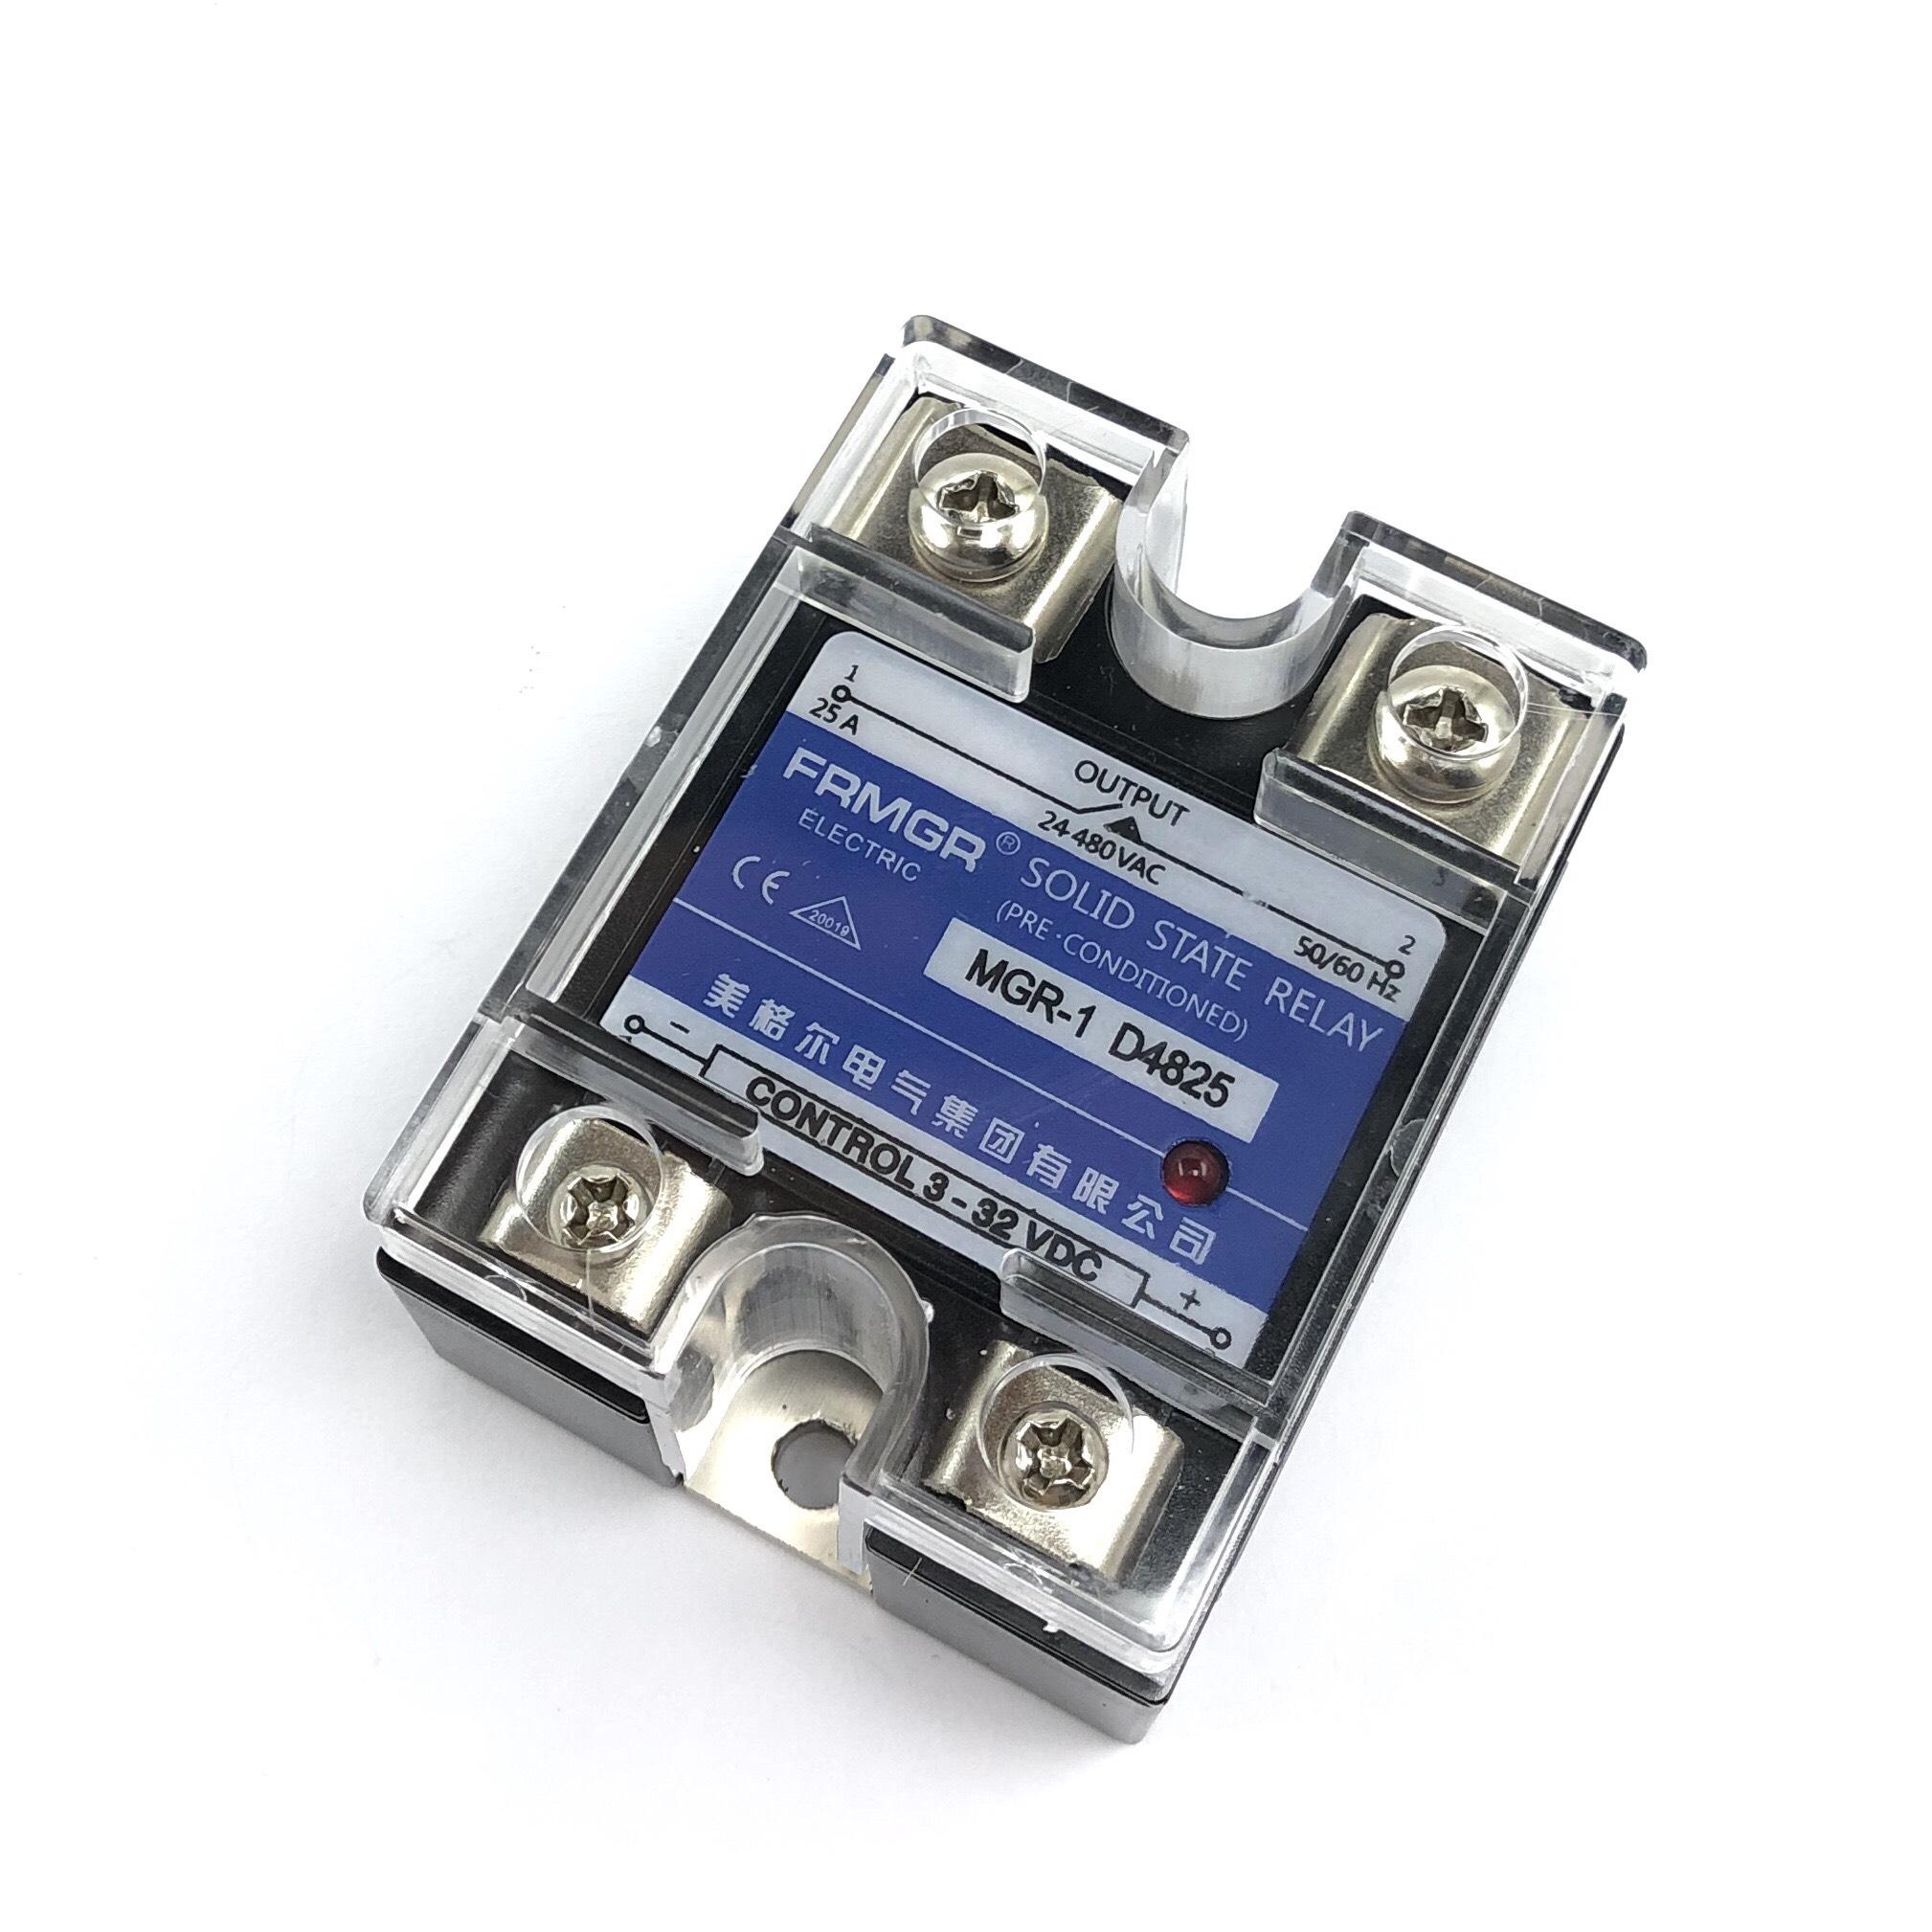 Relay bán dẫn SSR 25A MGR-1 D4825/Solid relay Mager - A10H12